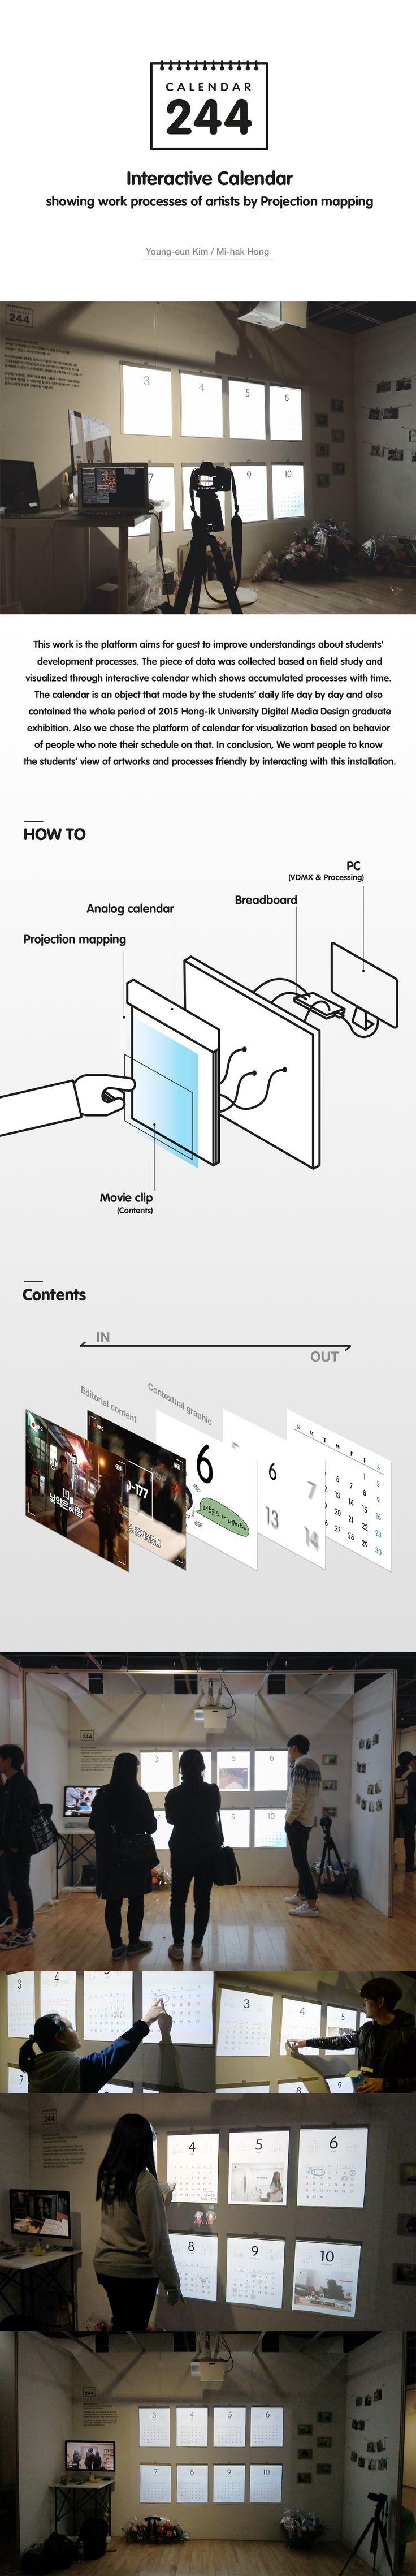 Young-eun Kim, Mi-hak Hong│ Calendar 244 - Interactive calendar showing work processes of artists by projection mapping│ Major in Digital Media Design │#hicoda │hicoda.hongik.ac.kr